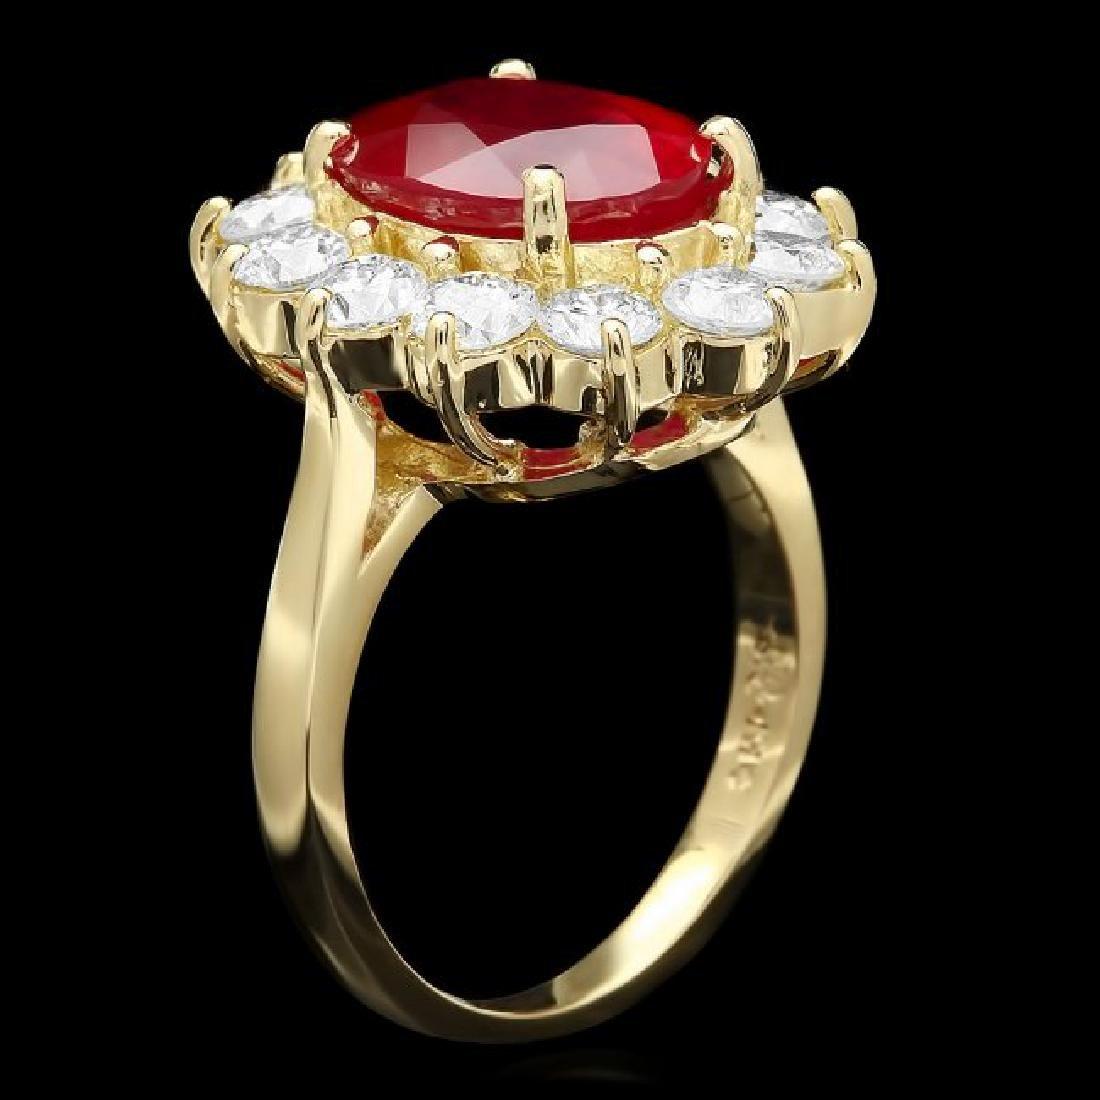 14k Yellow Gold 5.00ct Ruby 2.00ct Diamond Ring - 2